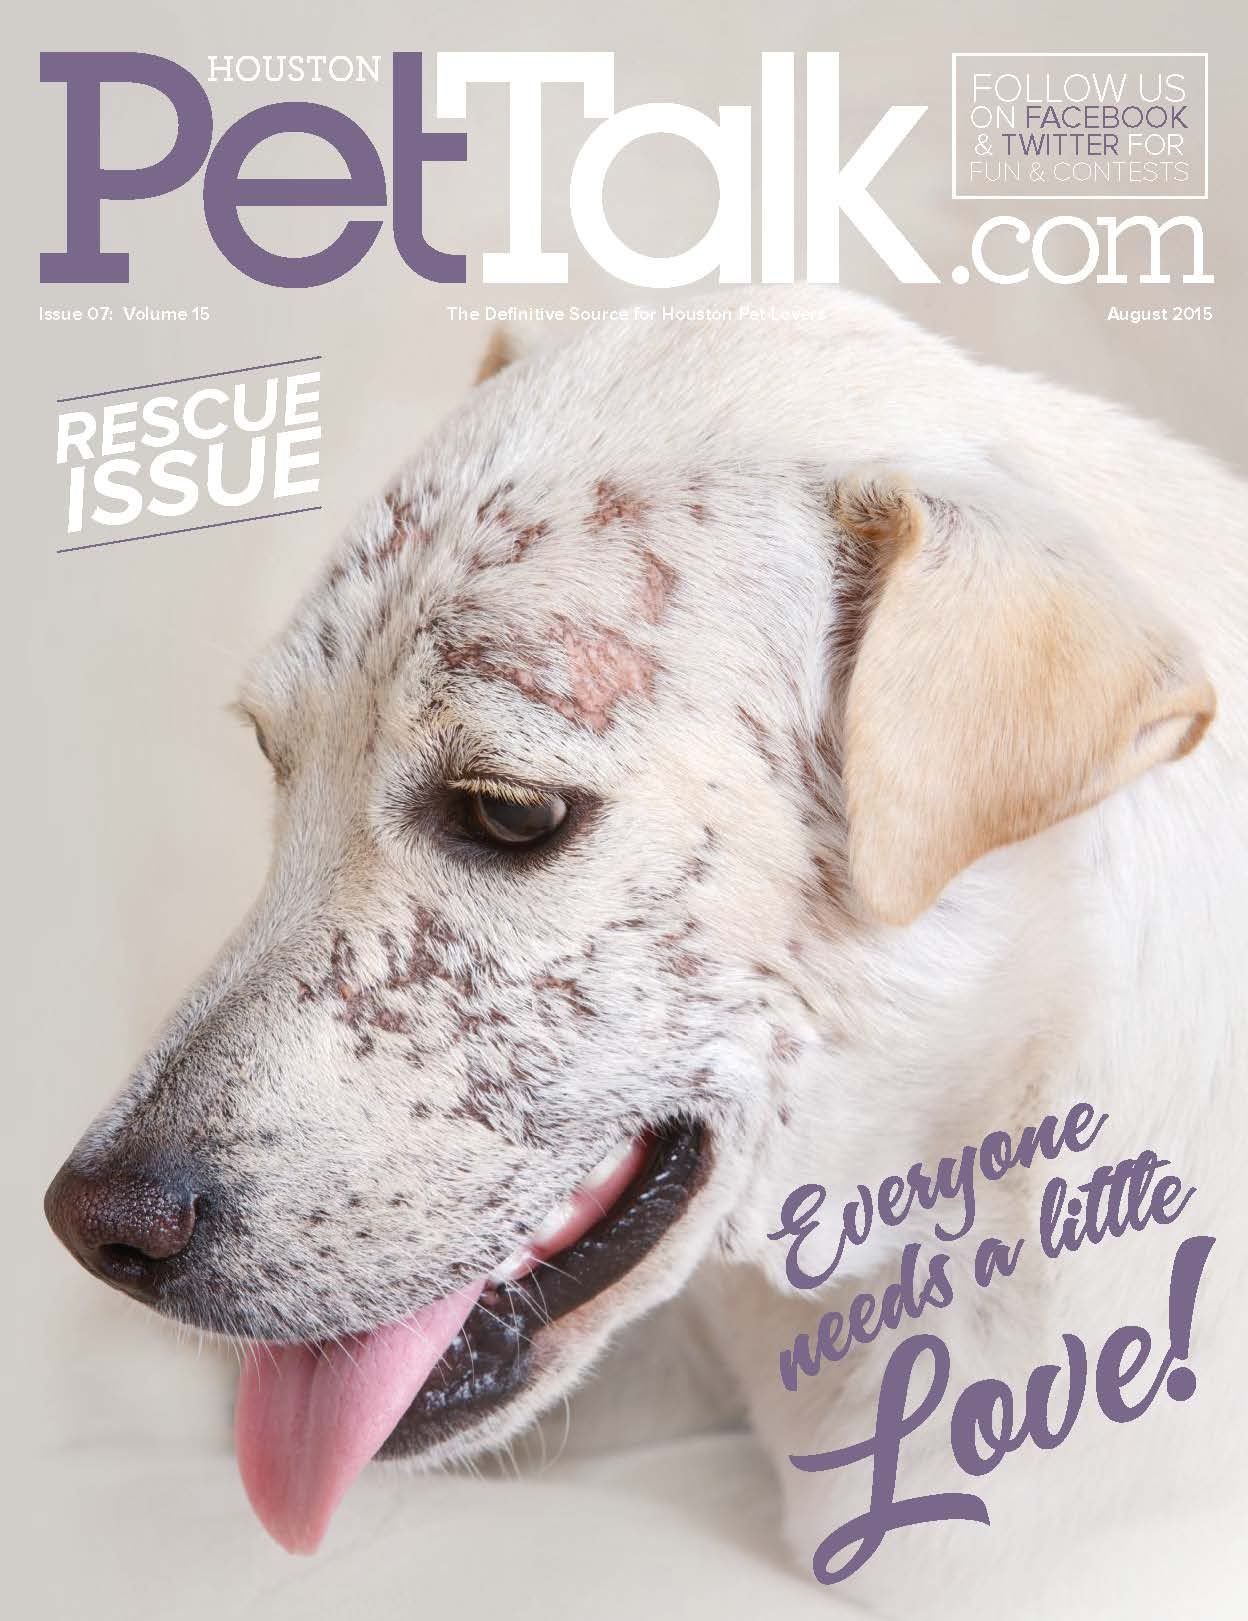 August 2015 Digital Issue of Houston PetTalk